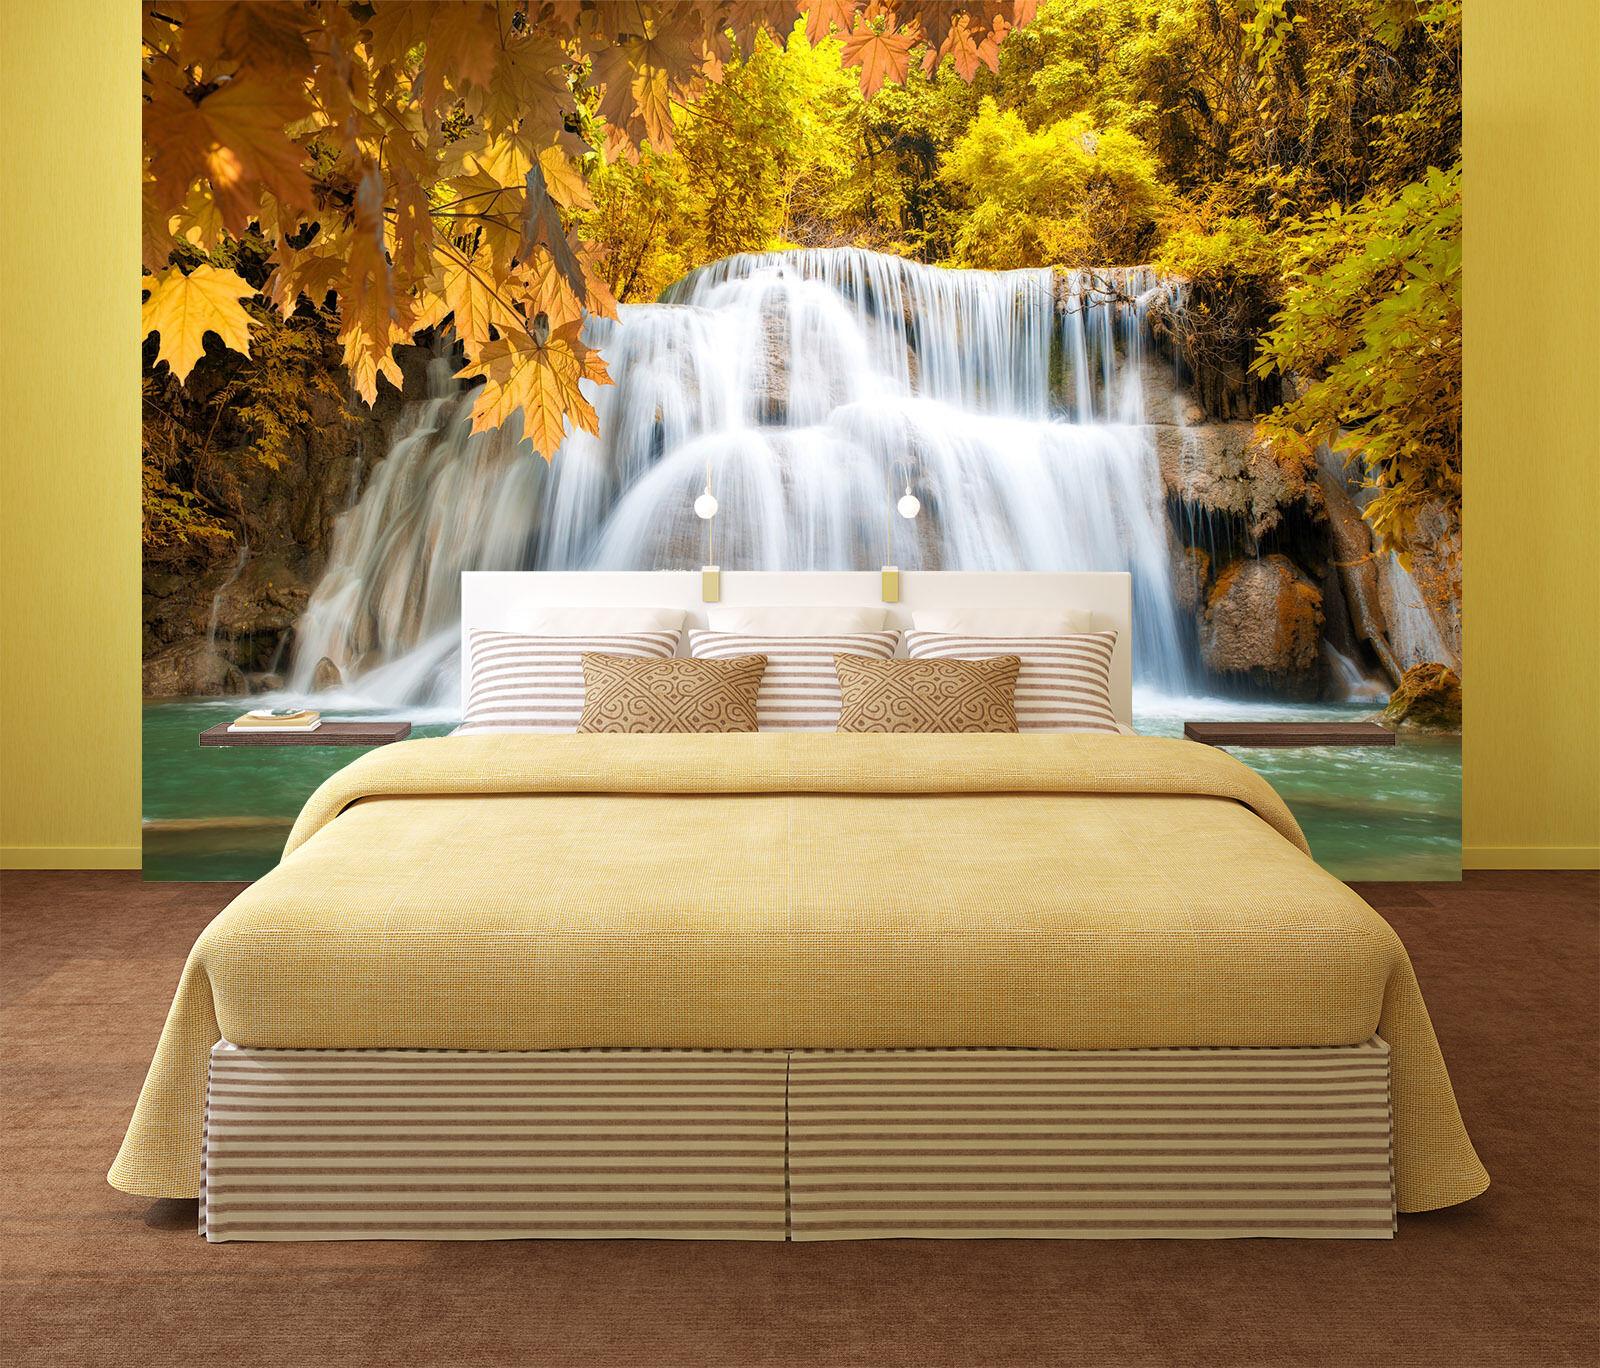 3D Waterfall leaf 2312 Wall Paper Wall Print Decal Decal Decal Wall Deco Indoor Wall Murals c58a90